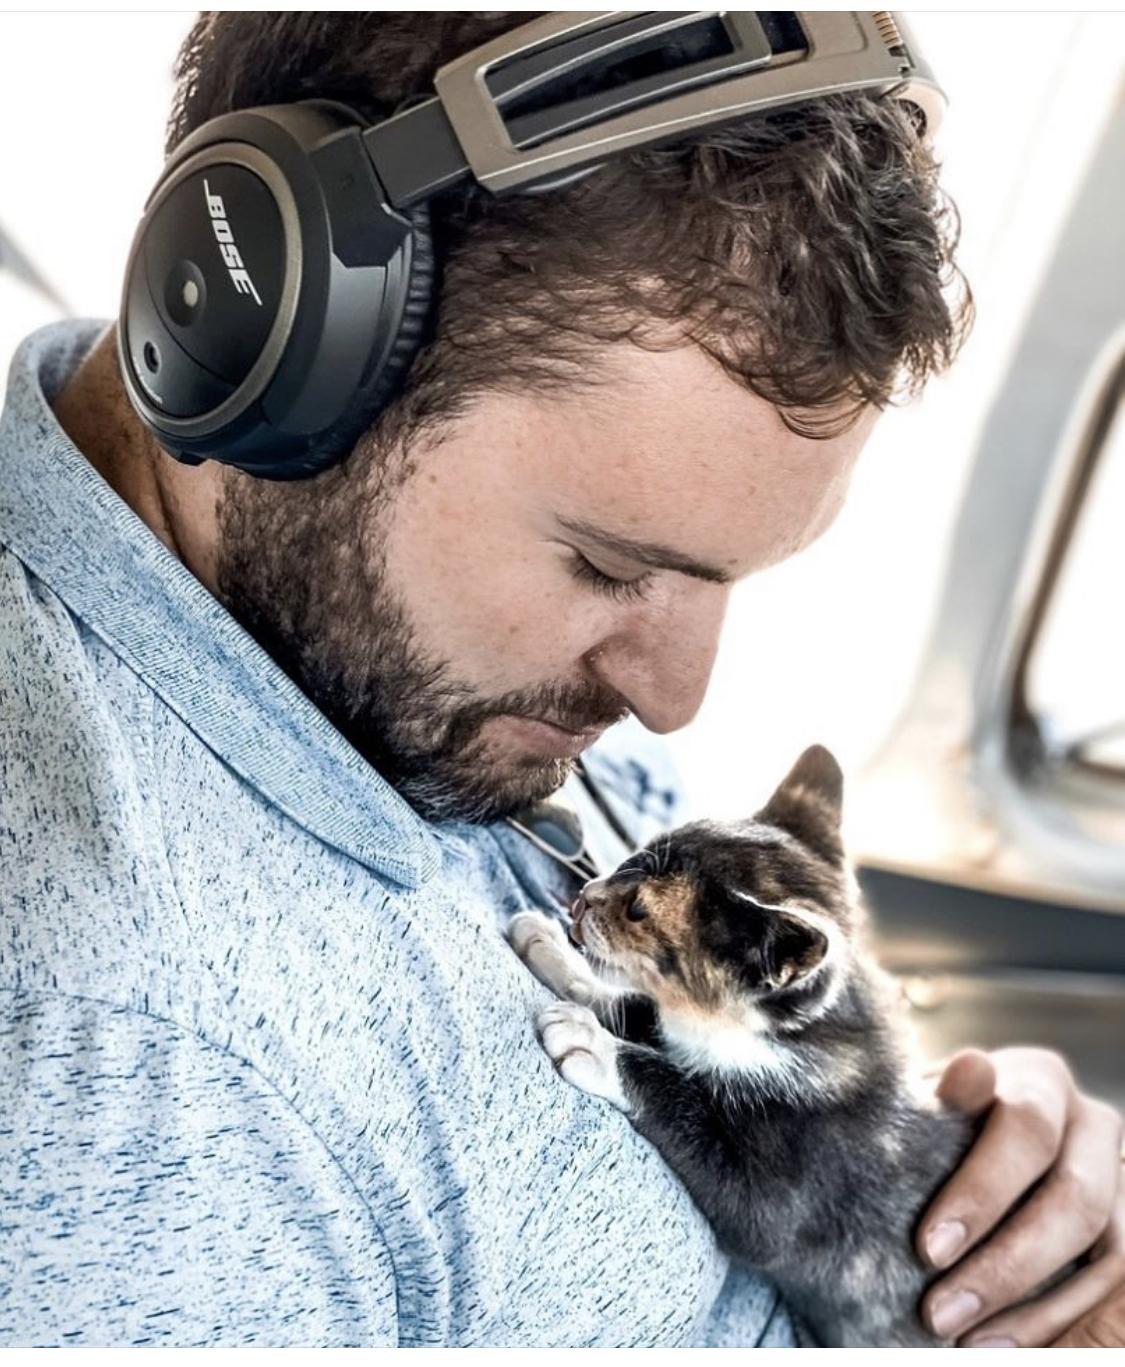 kitten held in cockpit by airline pilot